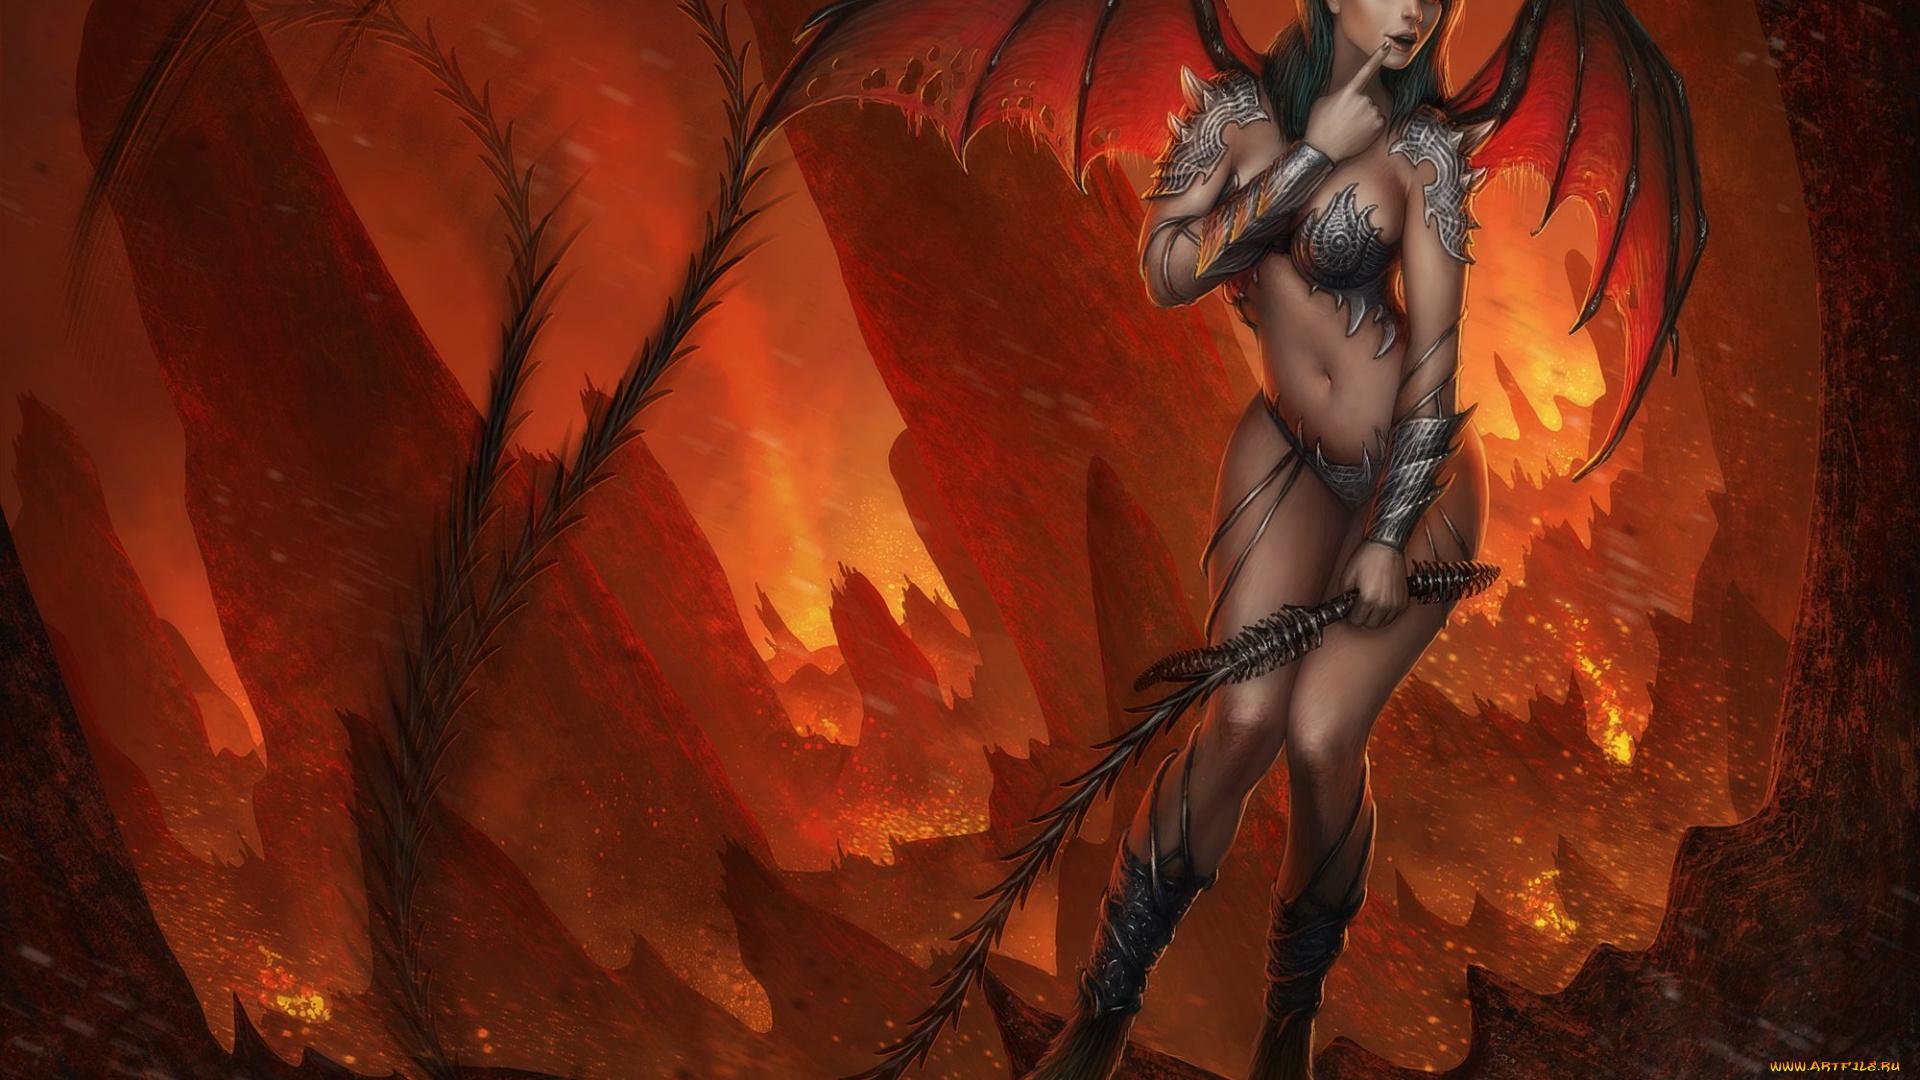 Demon sex games lok sexy movies